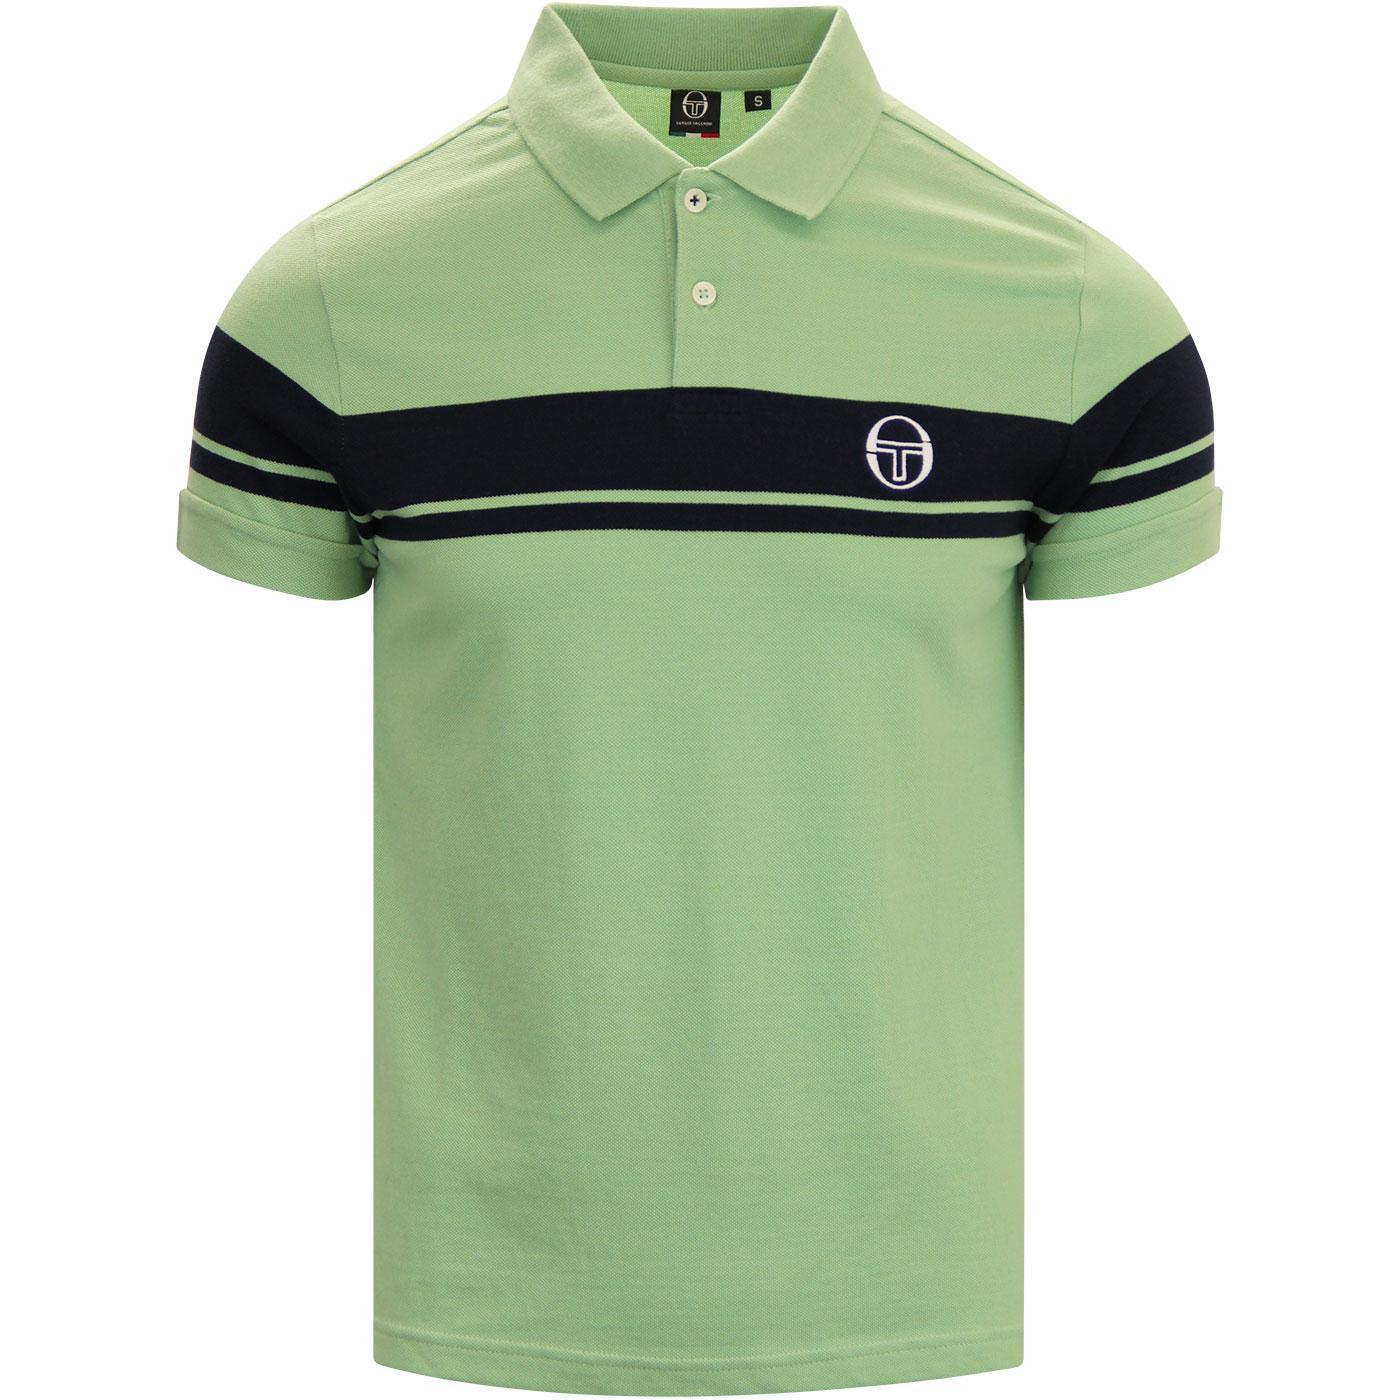 Young Line SERGIO TACCHINI Retro Polo Shirt (G/N)